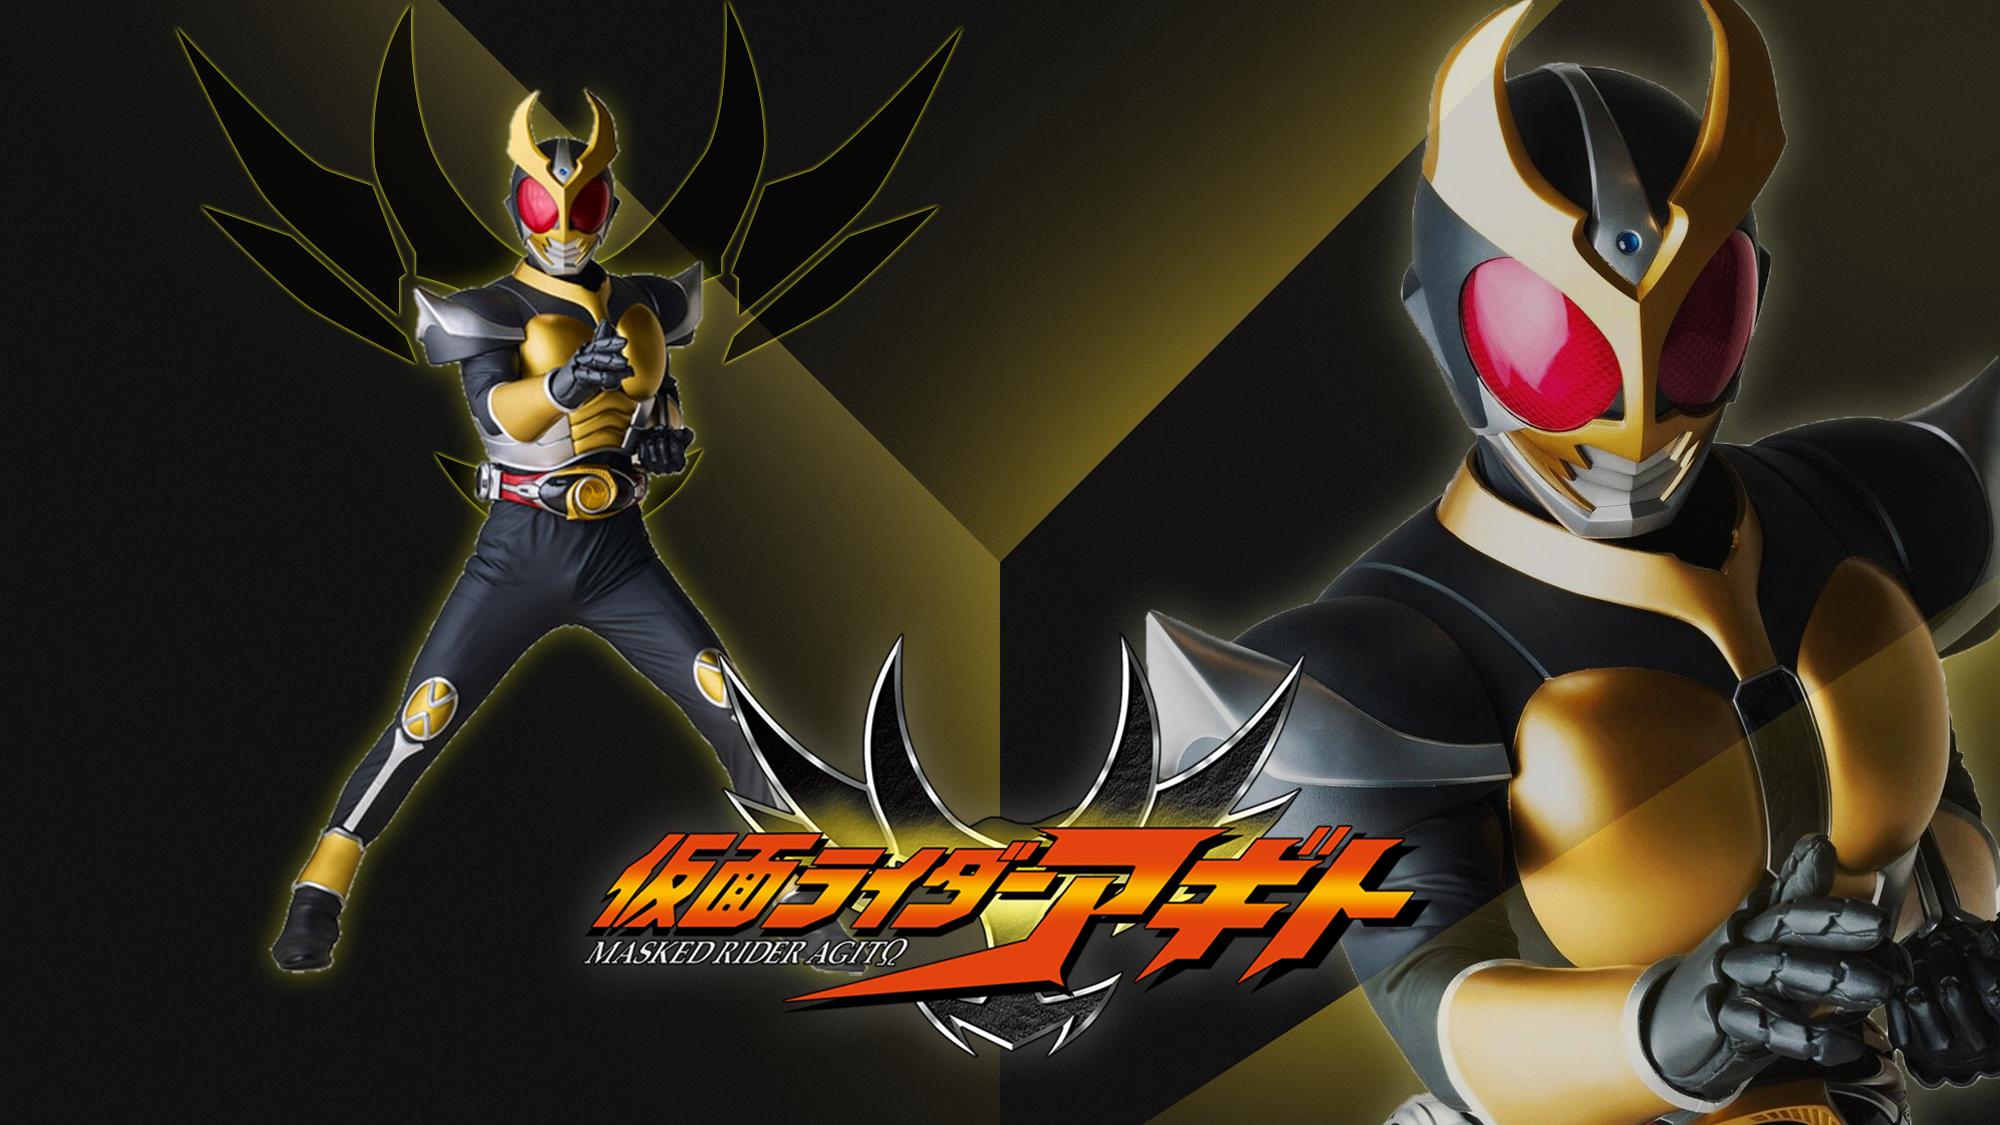 Kamen Rider llega a @FreeTVapp_ con doblaje latino